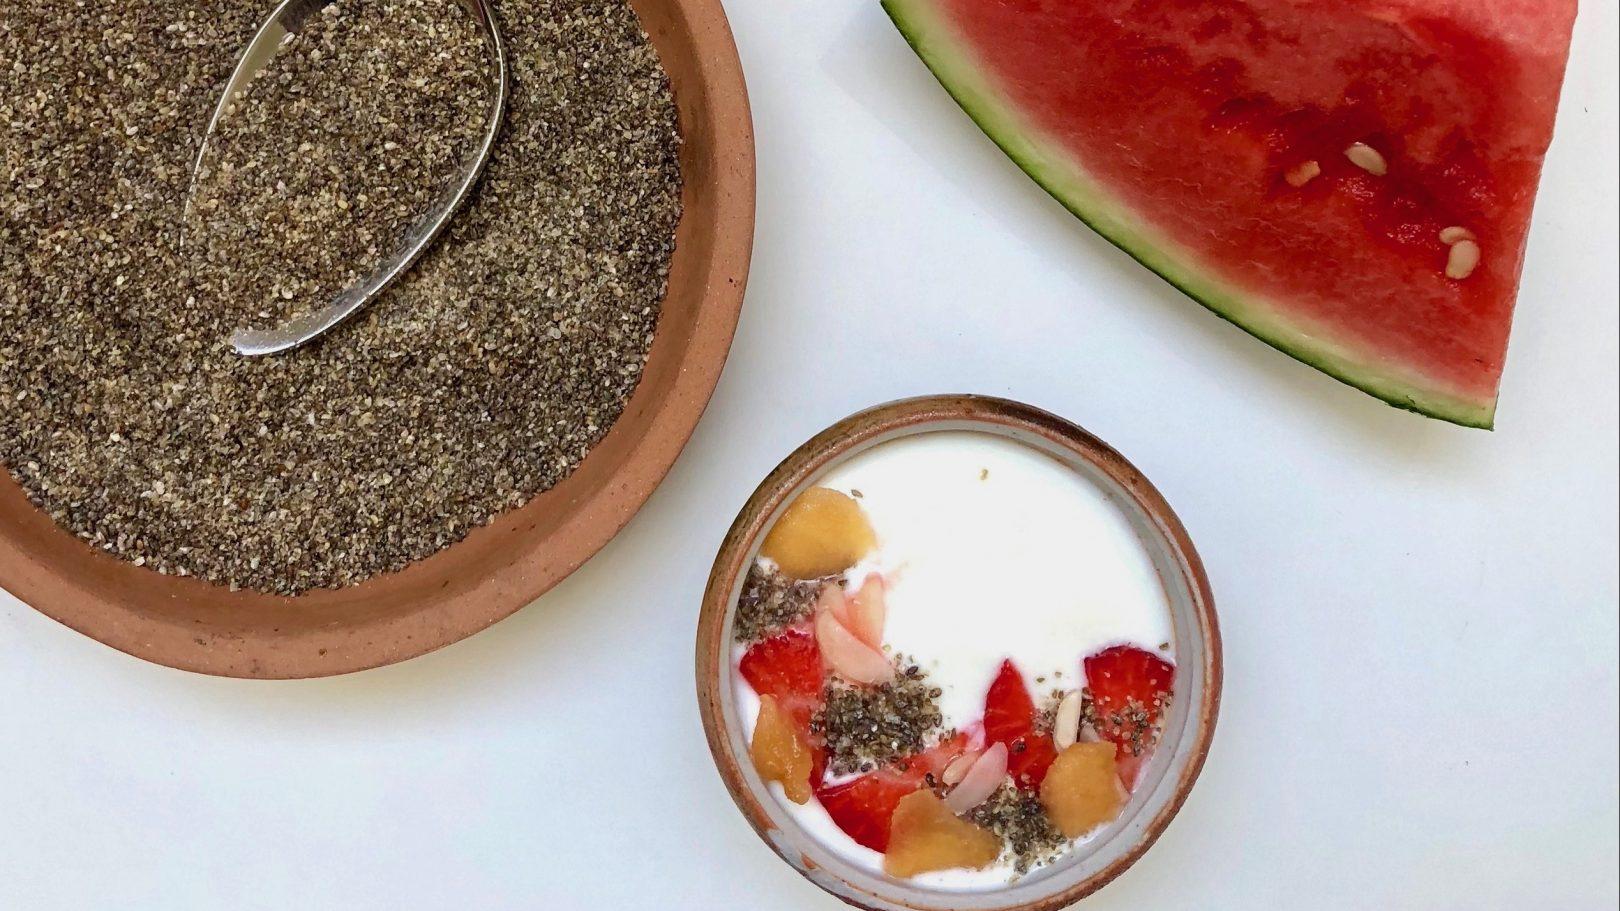 Watermelon seed powder